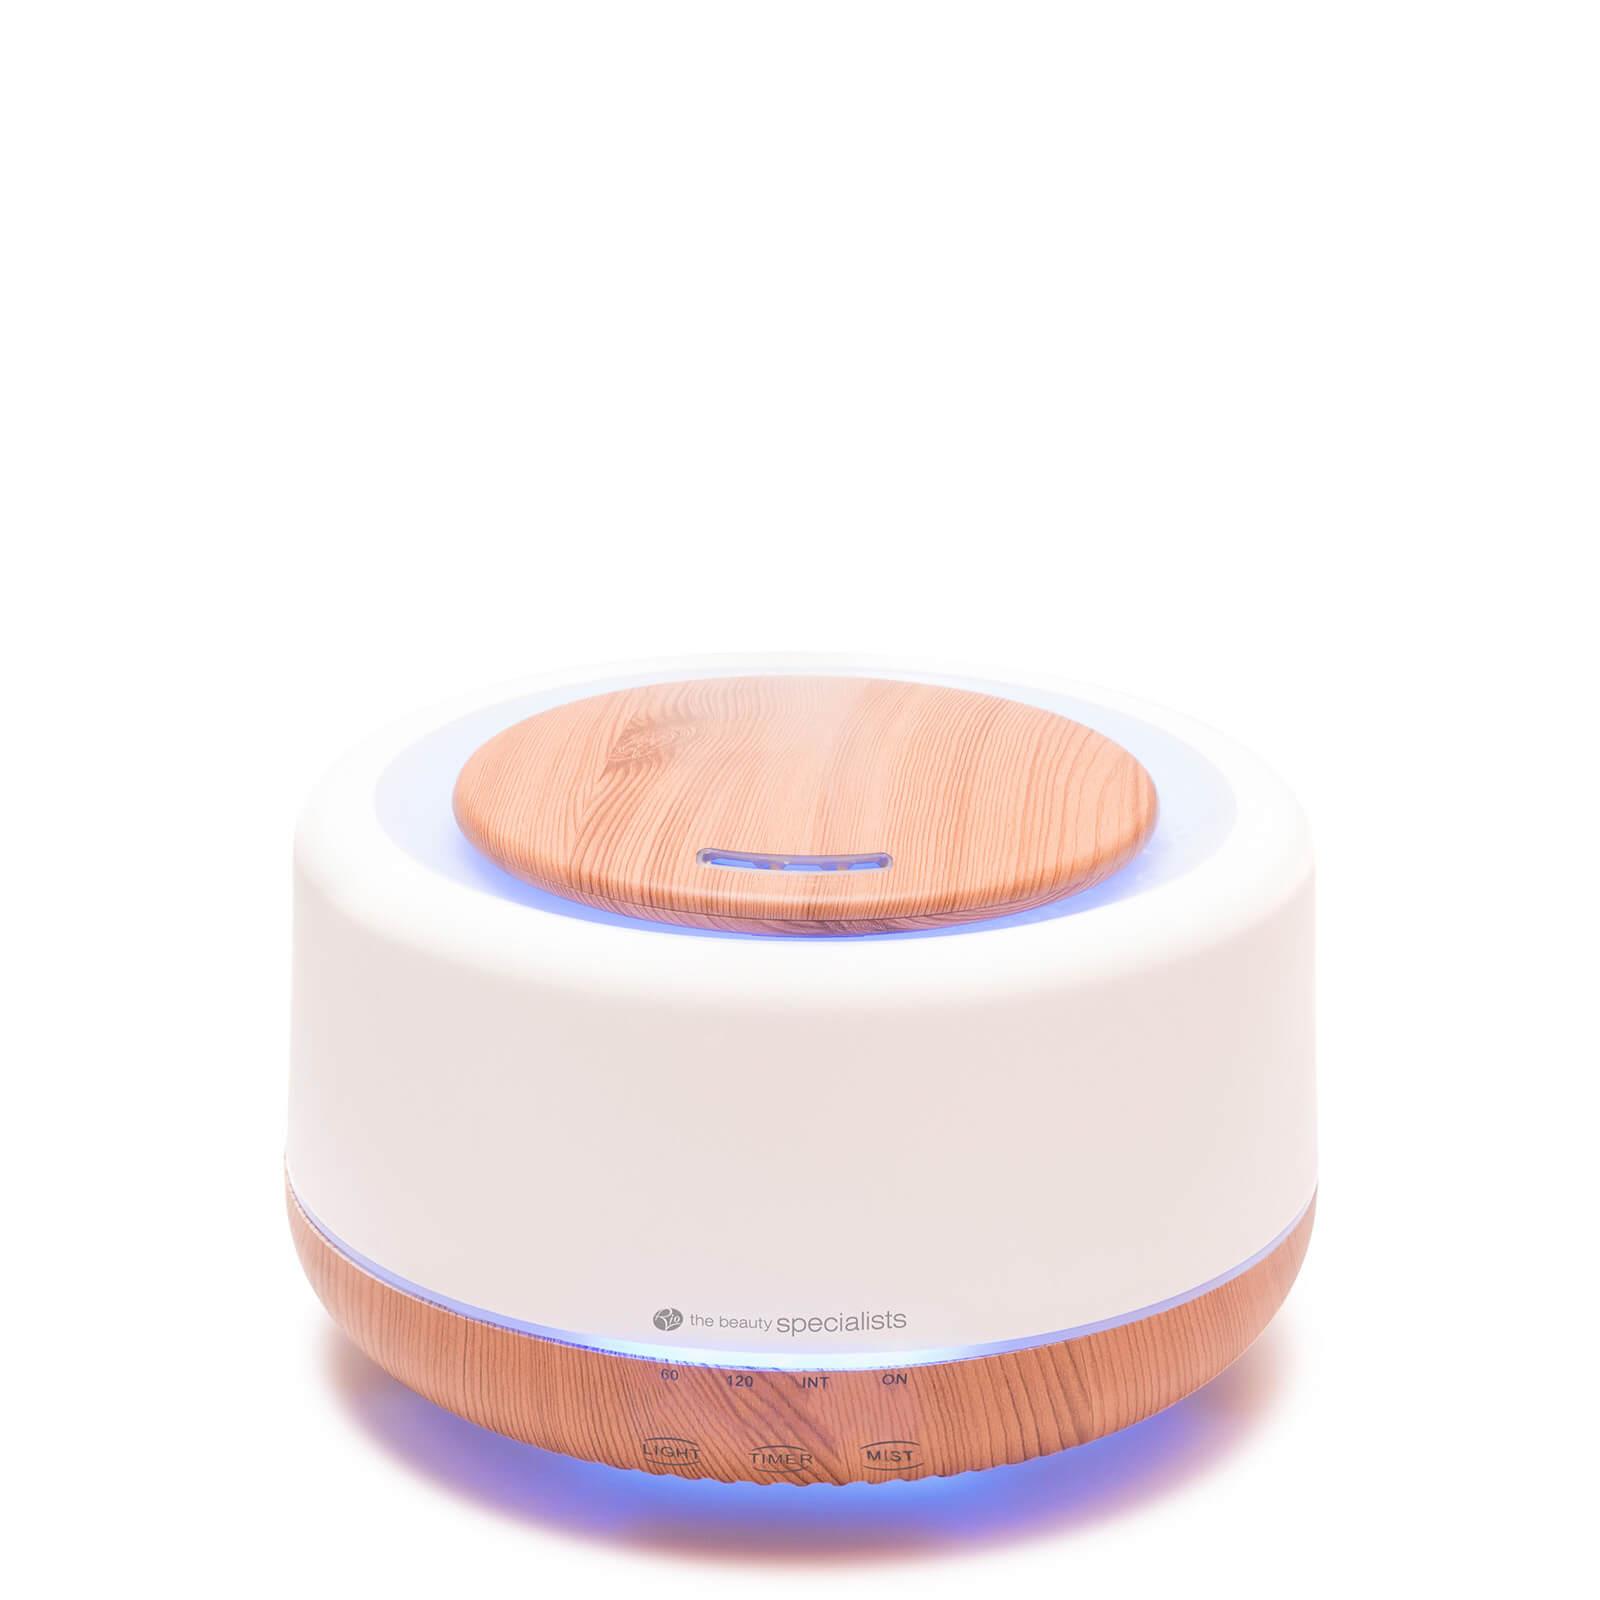 Купить Rio Alora Aroma Diffuser, Humidifier and Night-Light